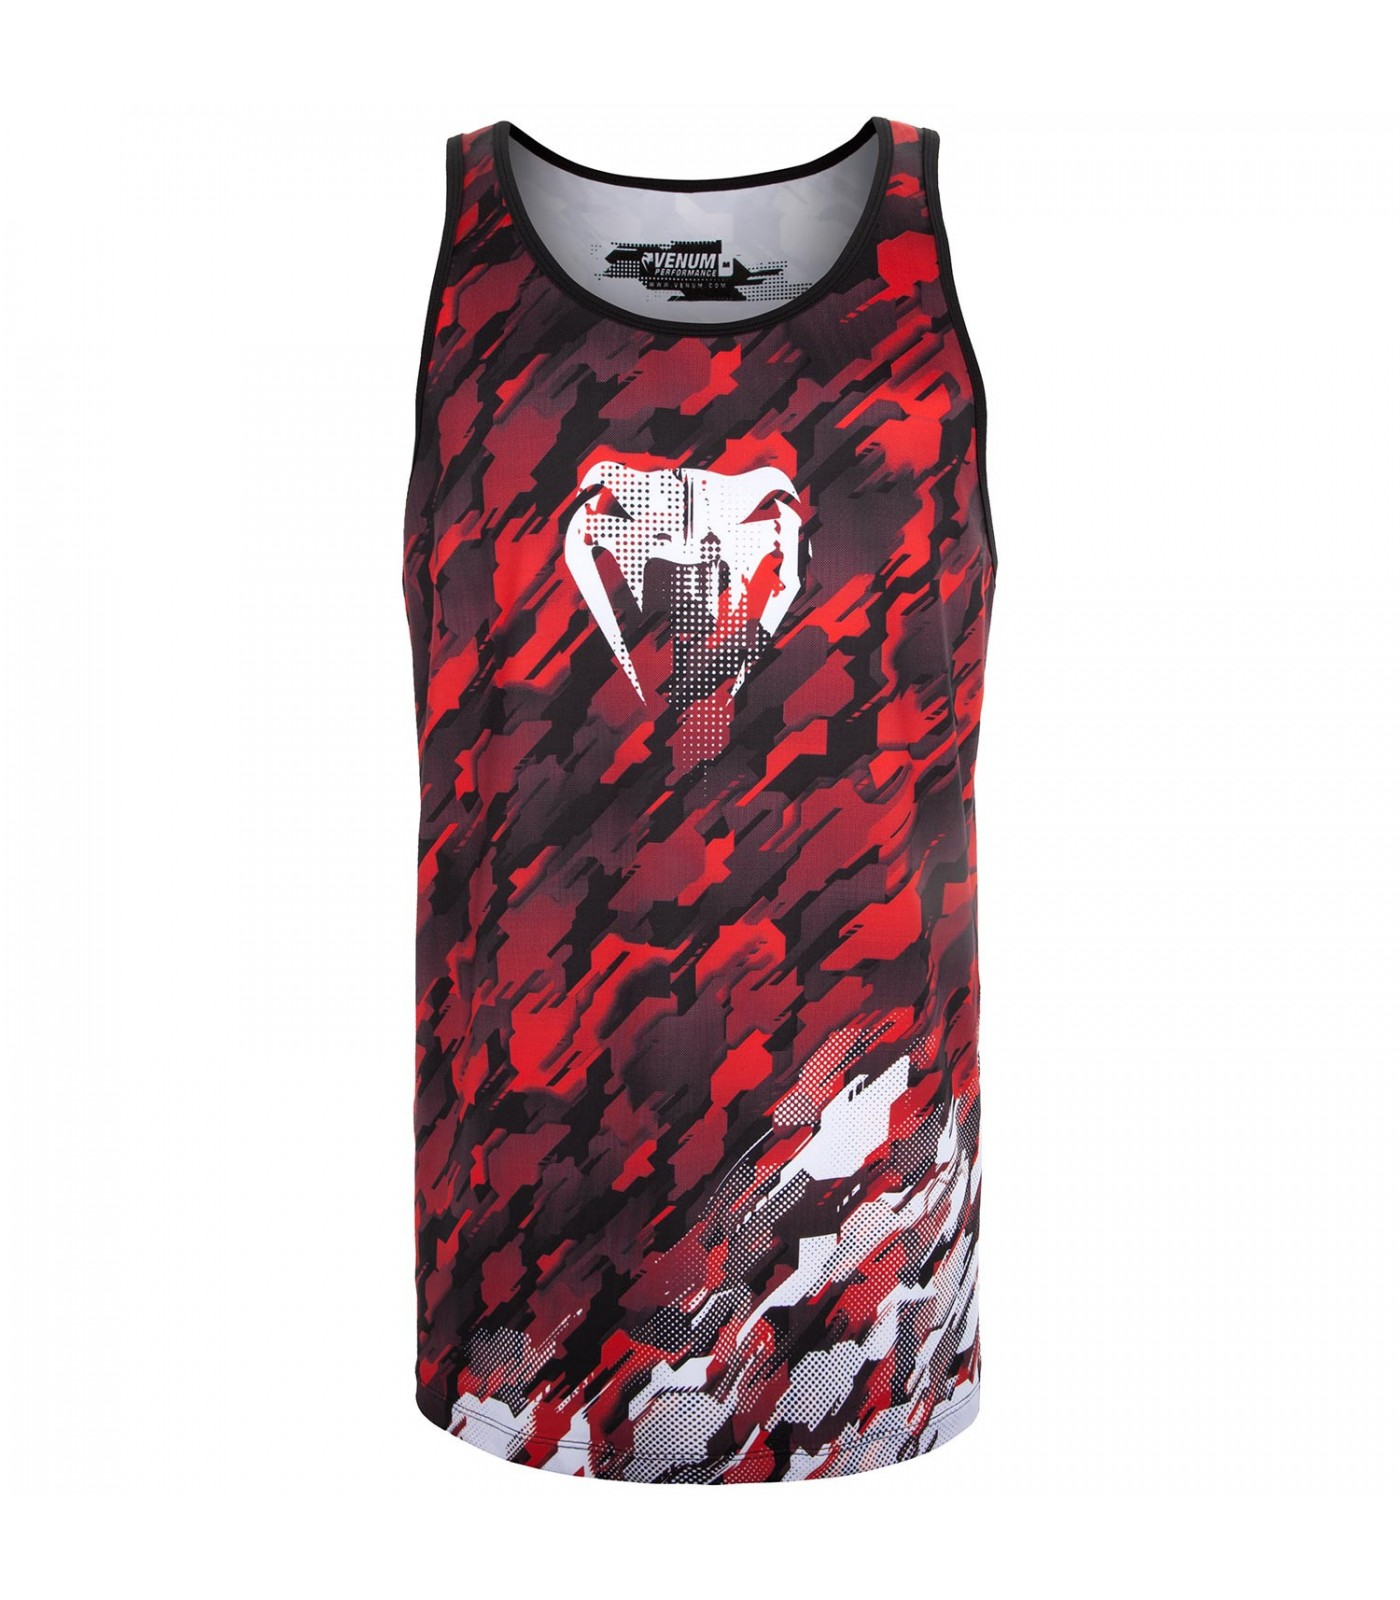 Потник - Venum Tecmo Tank Top - Red/White